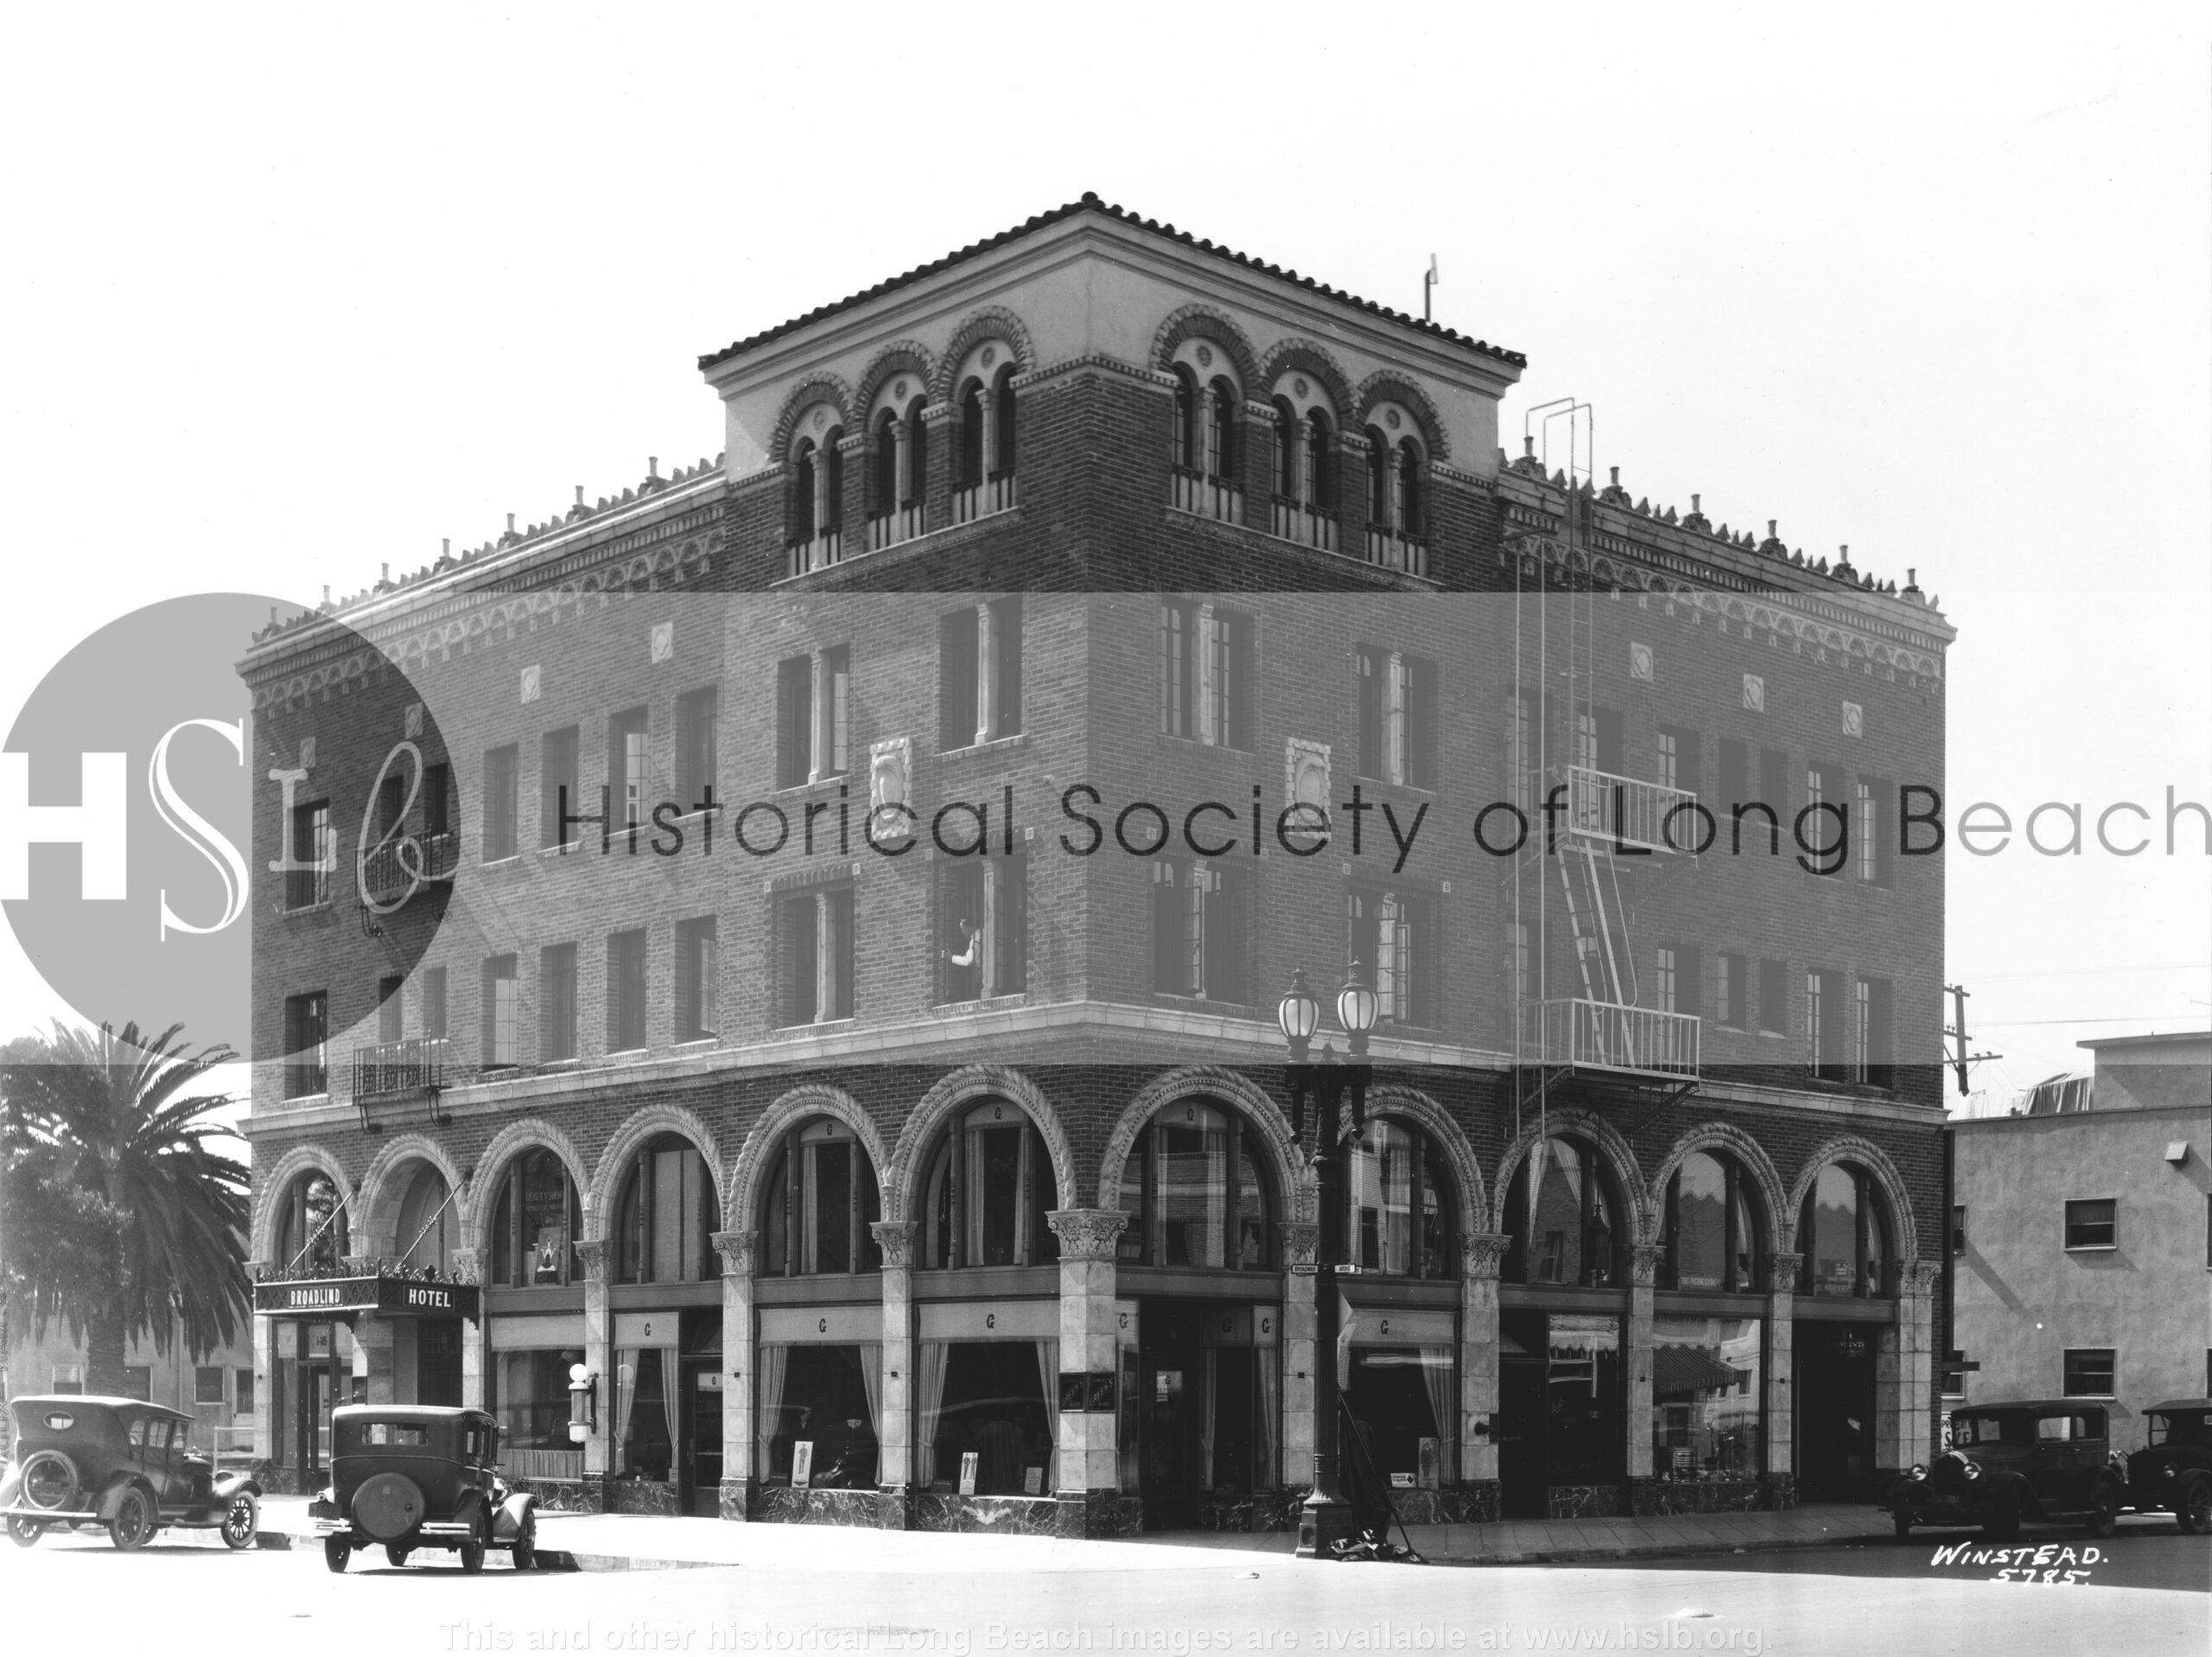 Broadlind Hotel, 1929